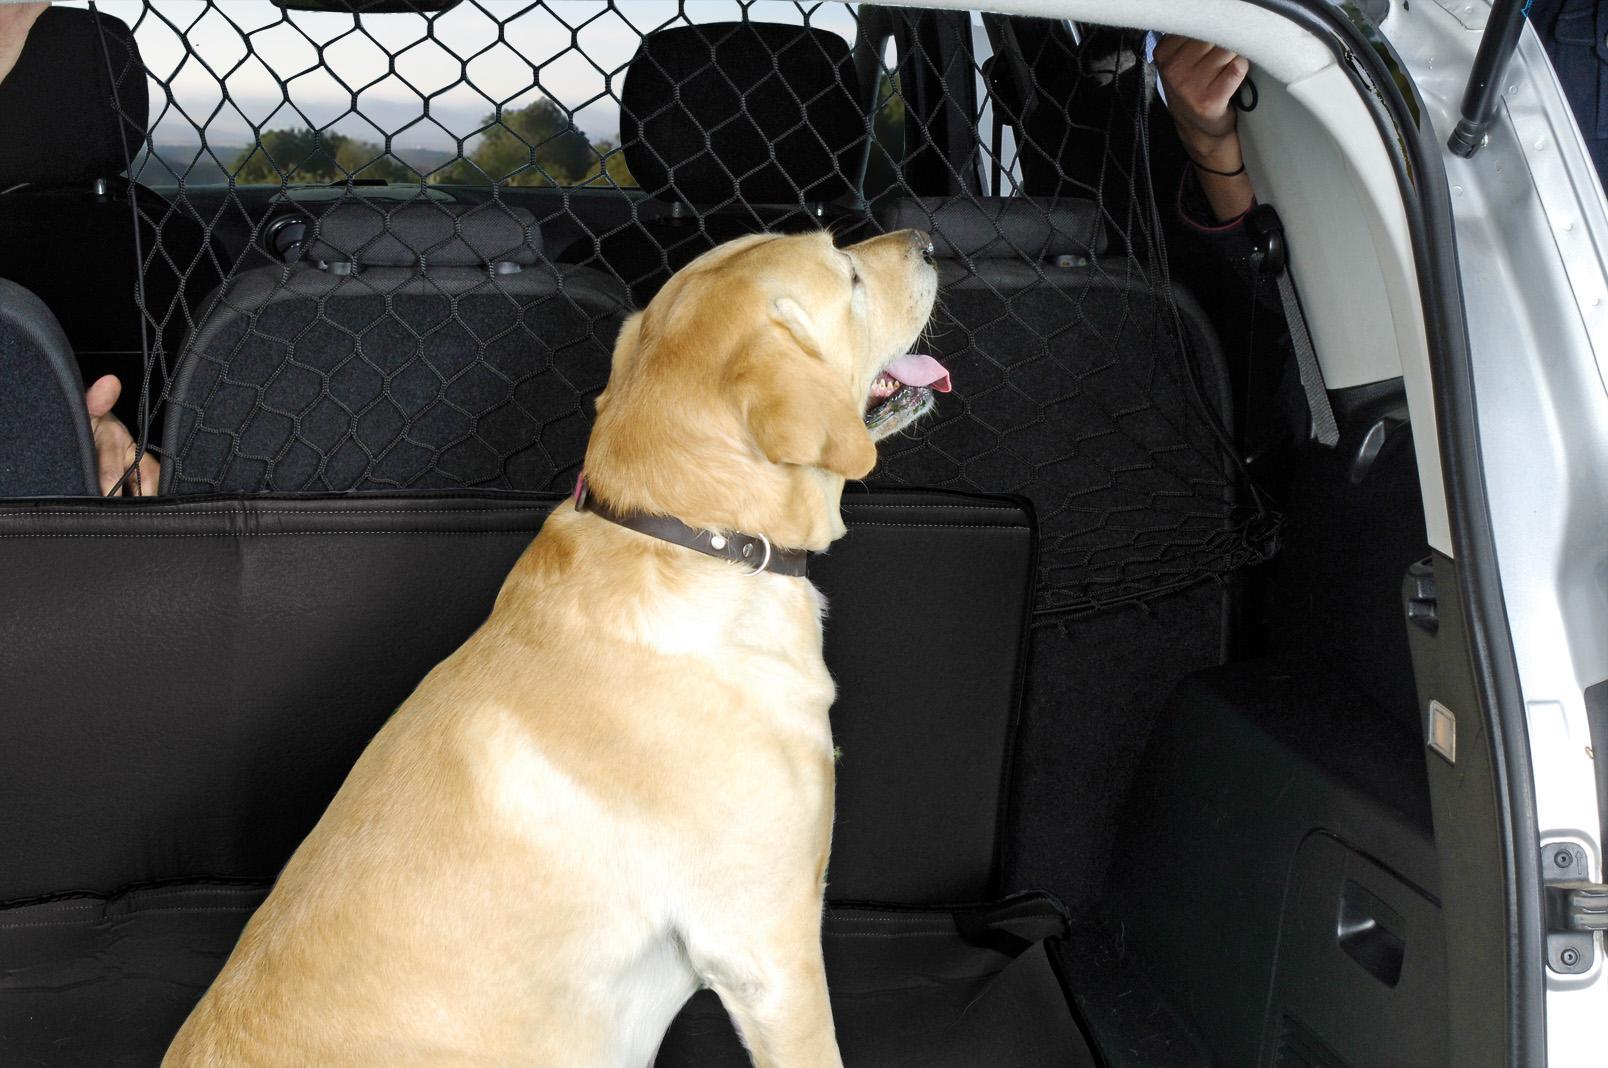 Autonet hond 01013084 DBS 01013084 van originele kwaliteit